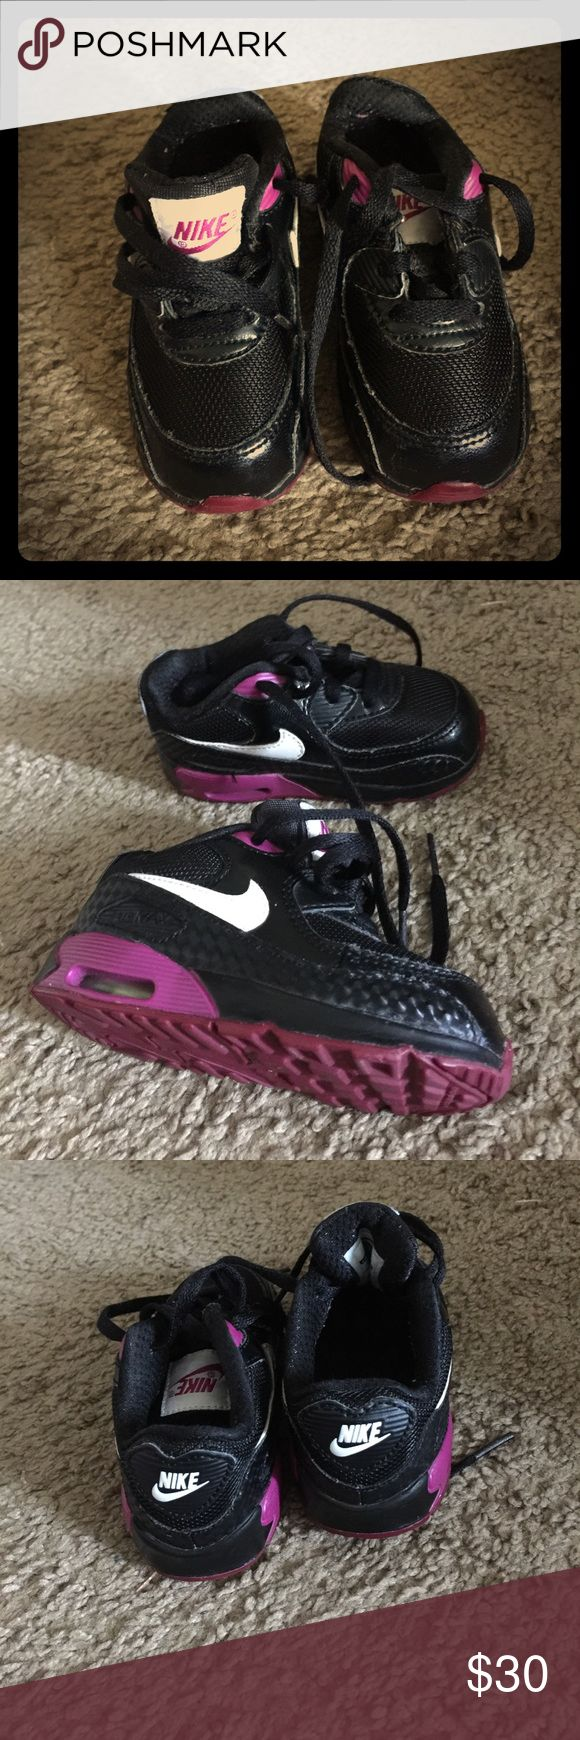 Purple and black Nike Beautiful black Nike shoes in good shape Shoes Sneakers